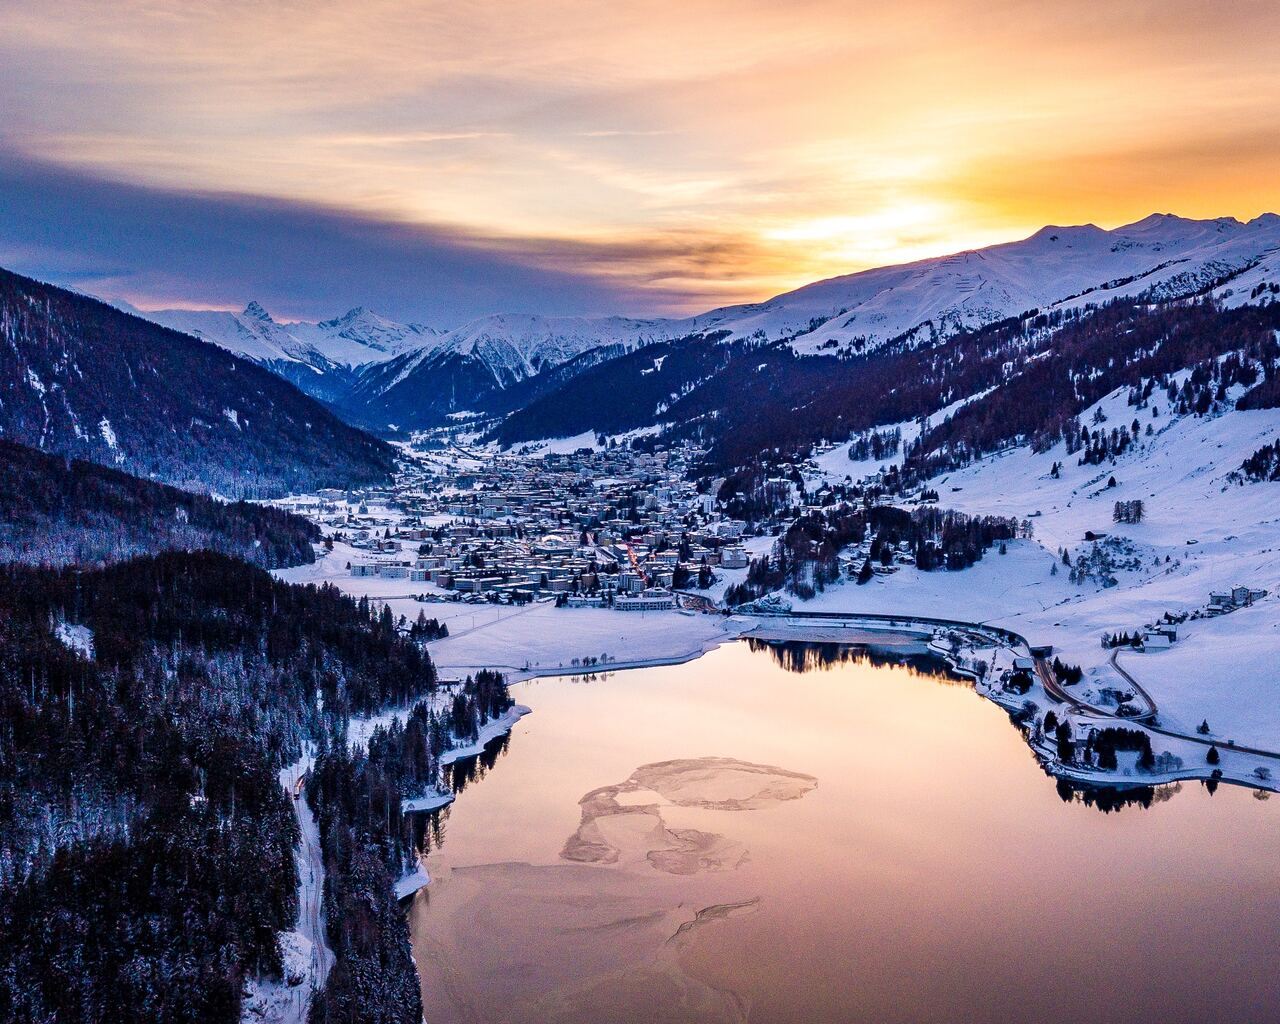 davos-switzerland-4k-0t.jpg